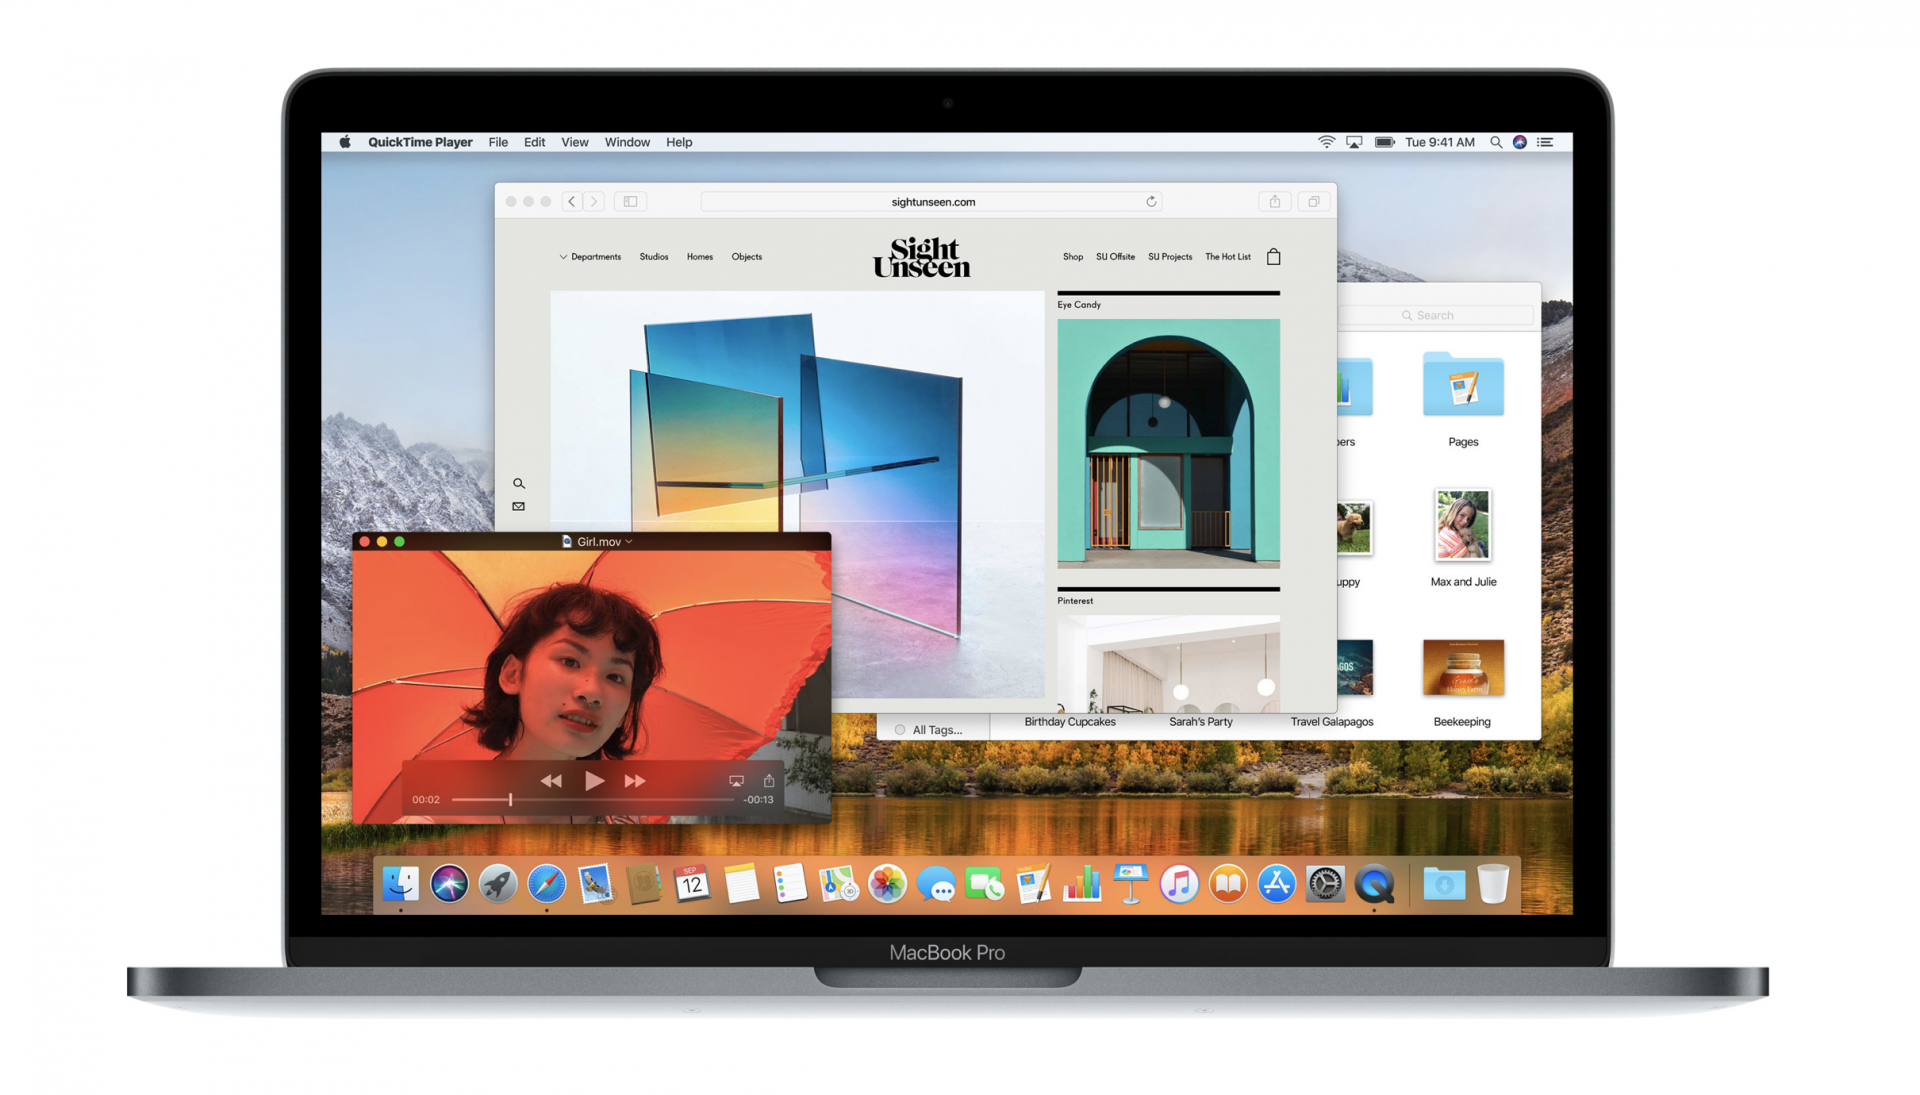 macOS High Sierra loggt erstmals App-Nutzung